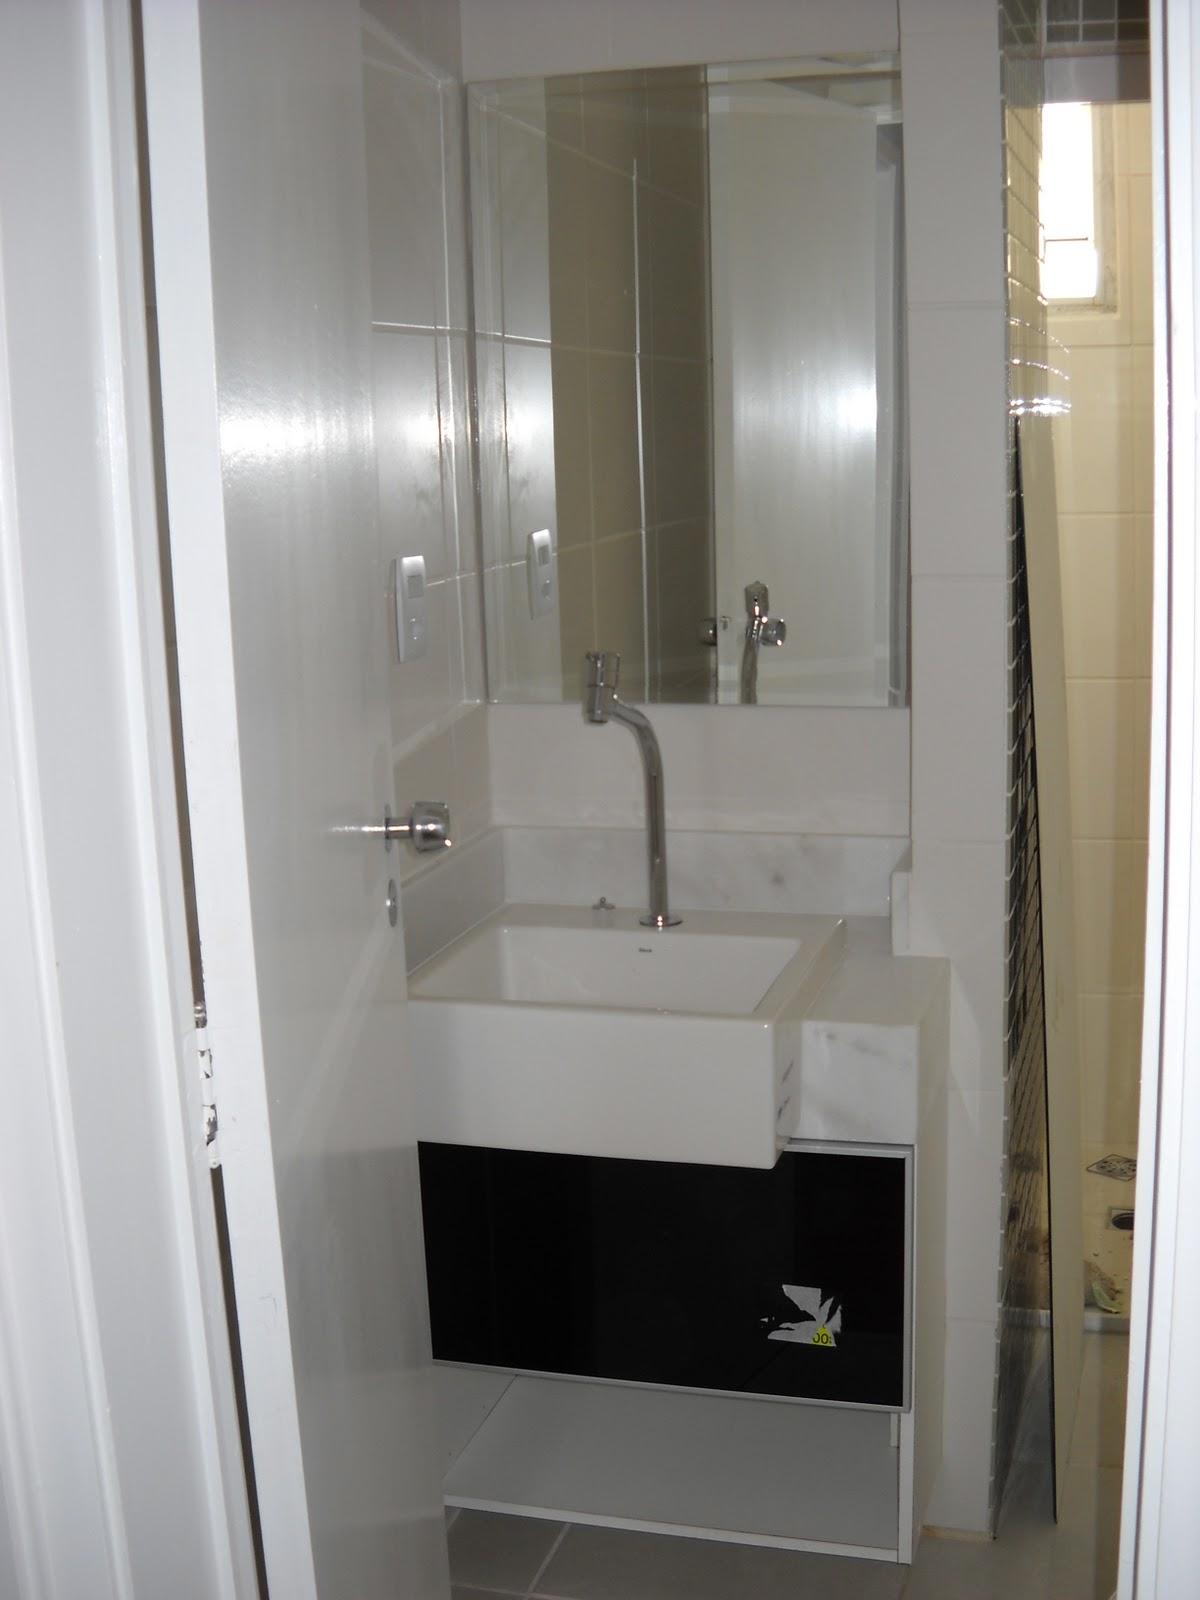 Imagens de #826F49 segunda feira 4 de outubro de 2010 1200x1600 px 3250 Box Acrilico Para Banheiro Feira De Santana